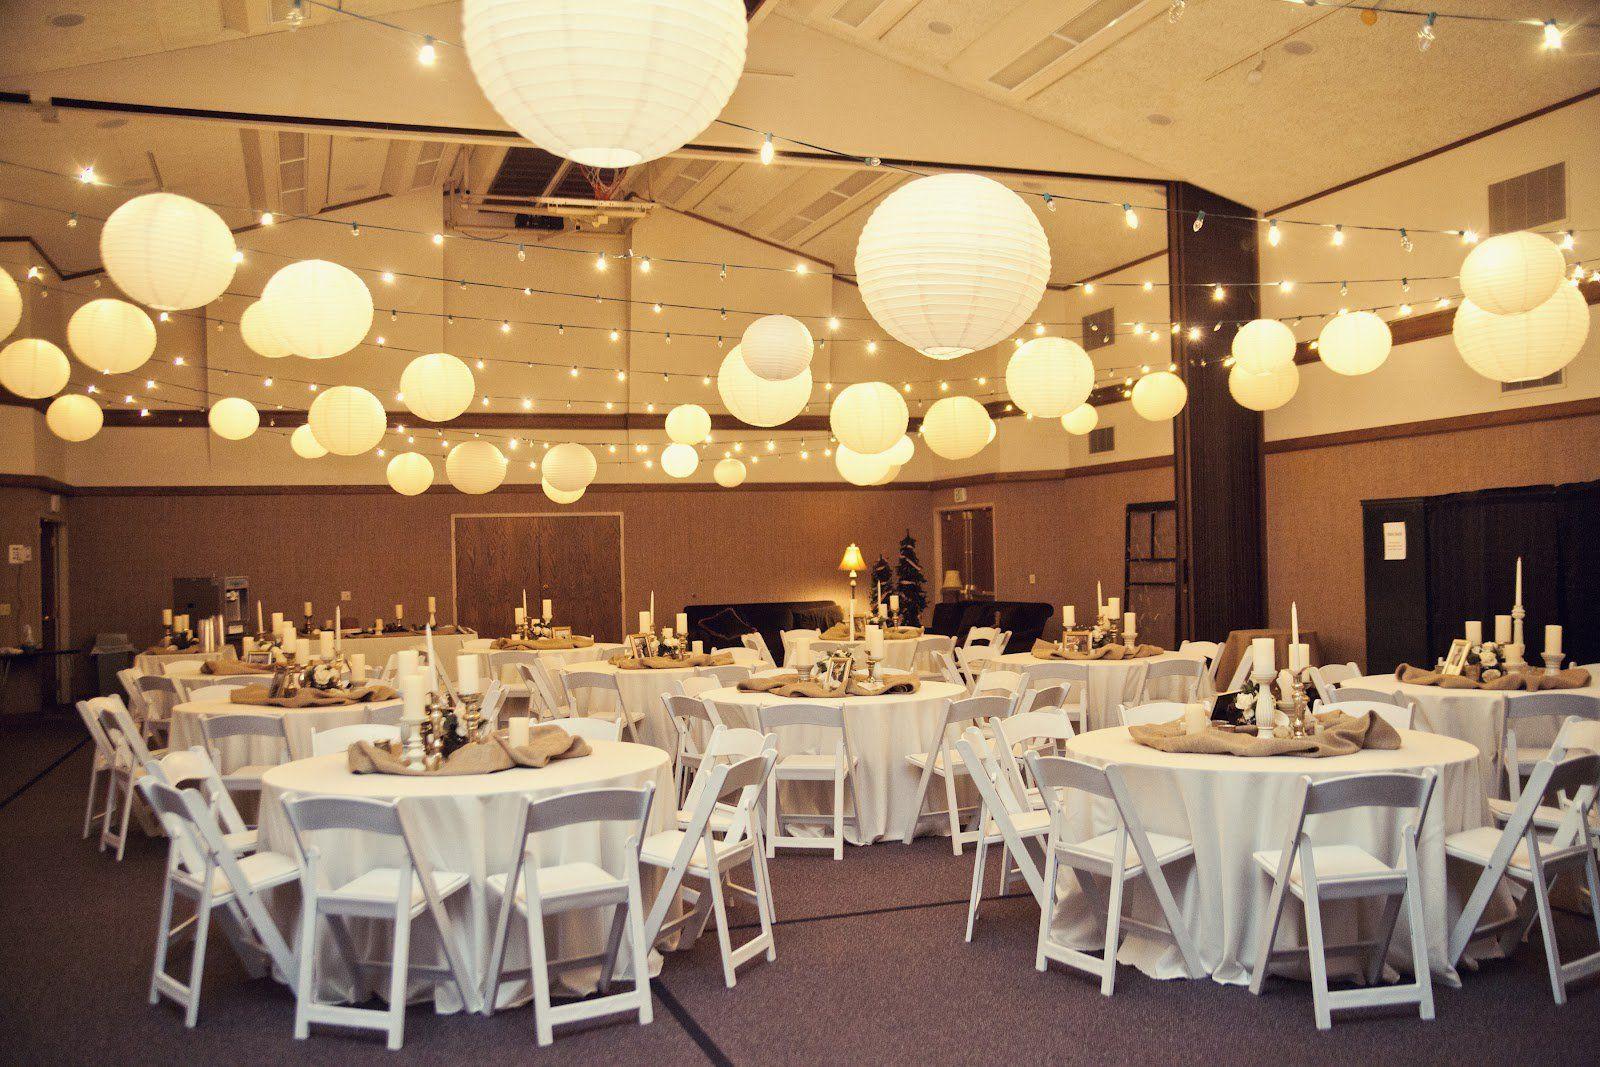 Risultati immagini per low budget wedding decorations | Wedding ...